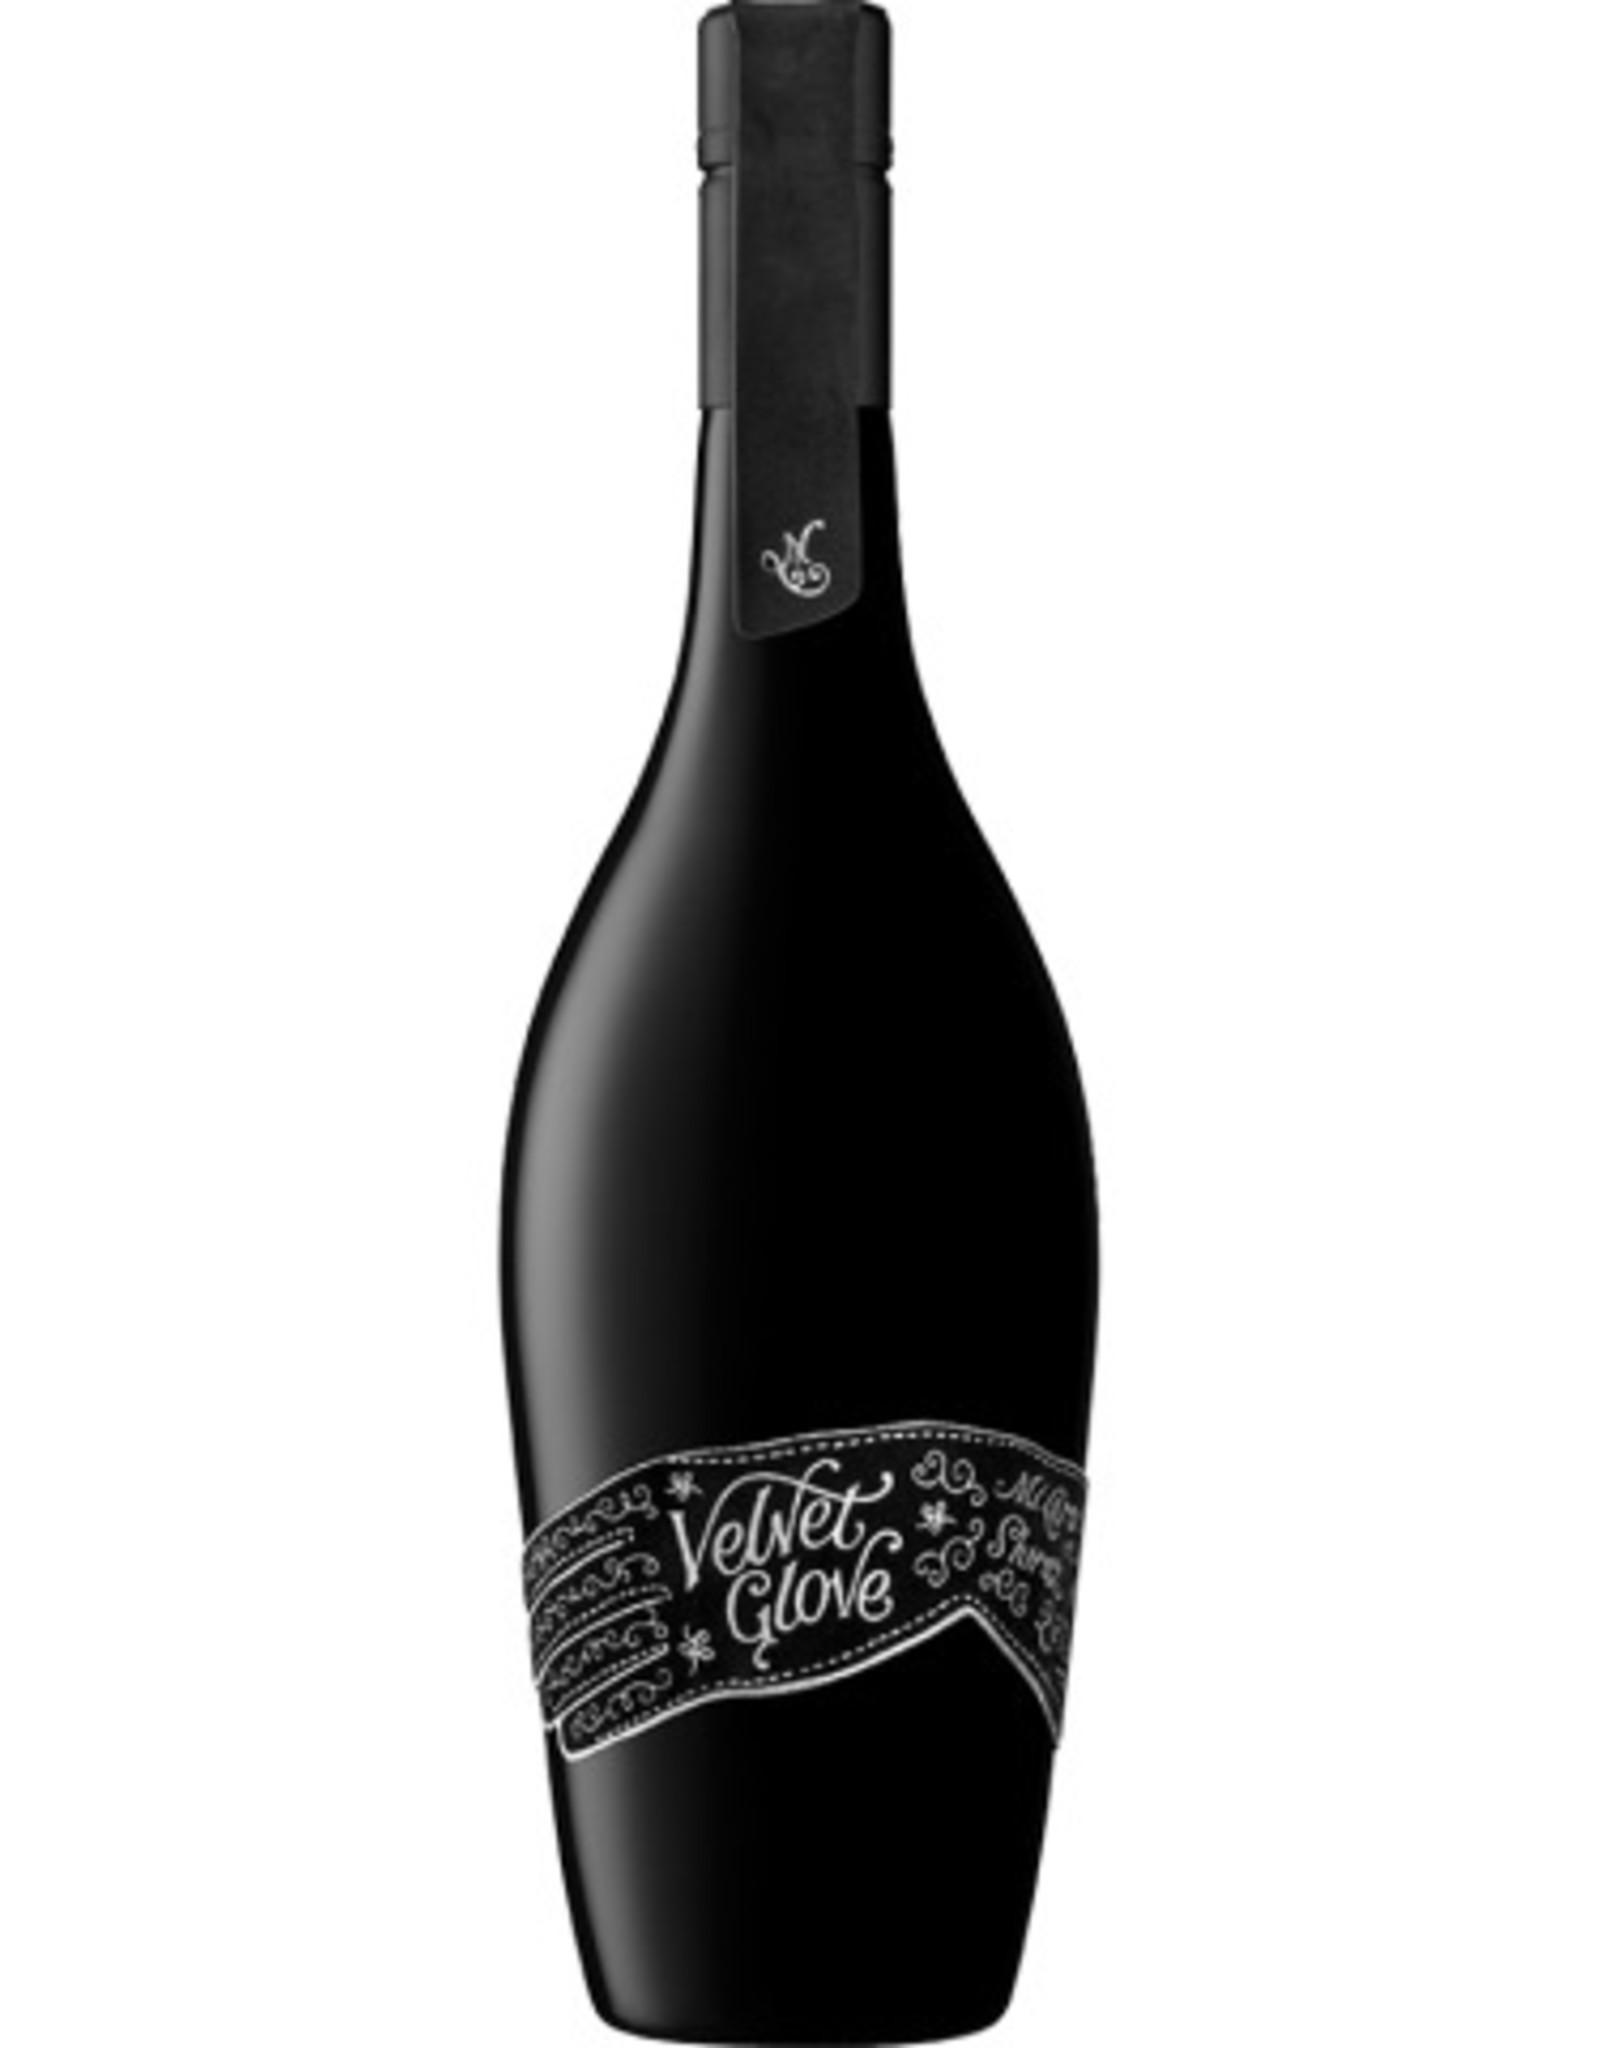 Red Wine 2014, Molly Dooker Velvet Glove, Shiraz, McLaren Vale,Fleurieu, Australia, 16.5% Alc, CT95, WS96